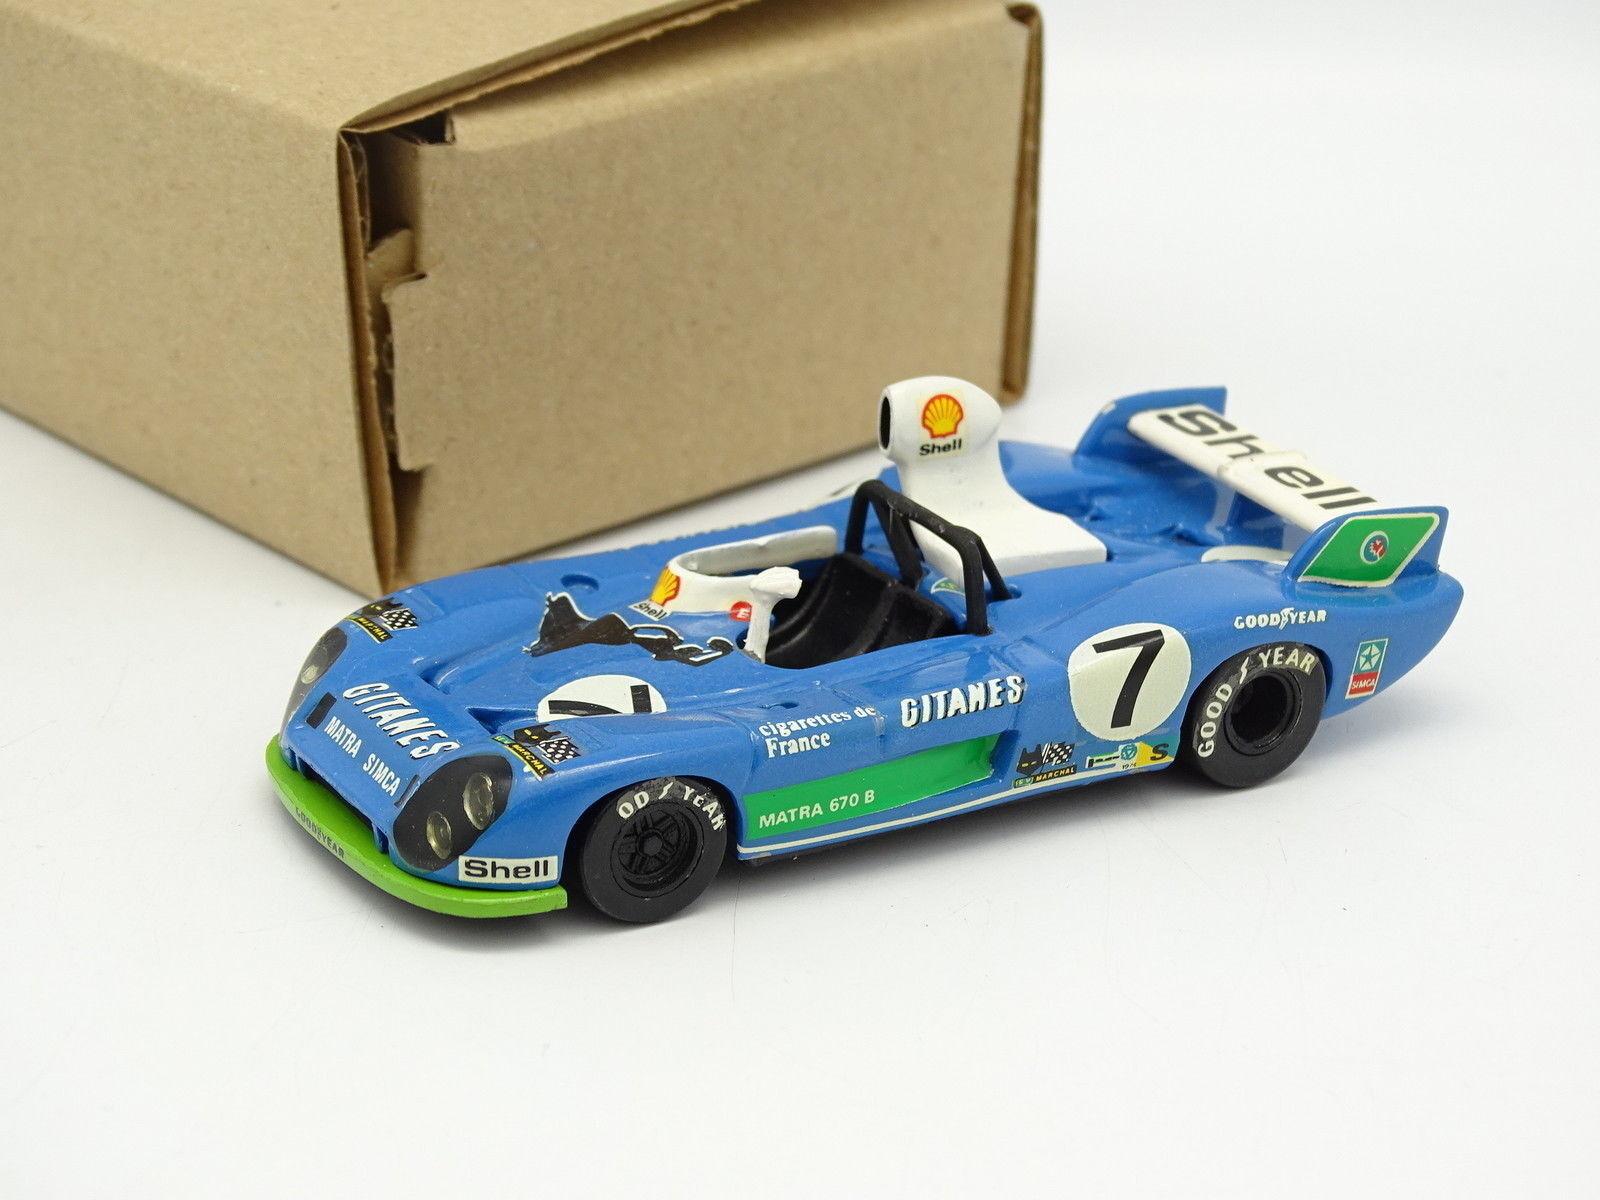 Eligor Evrat 1/43 - Matra 680 Le Mans 1974 No.7